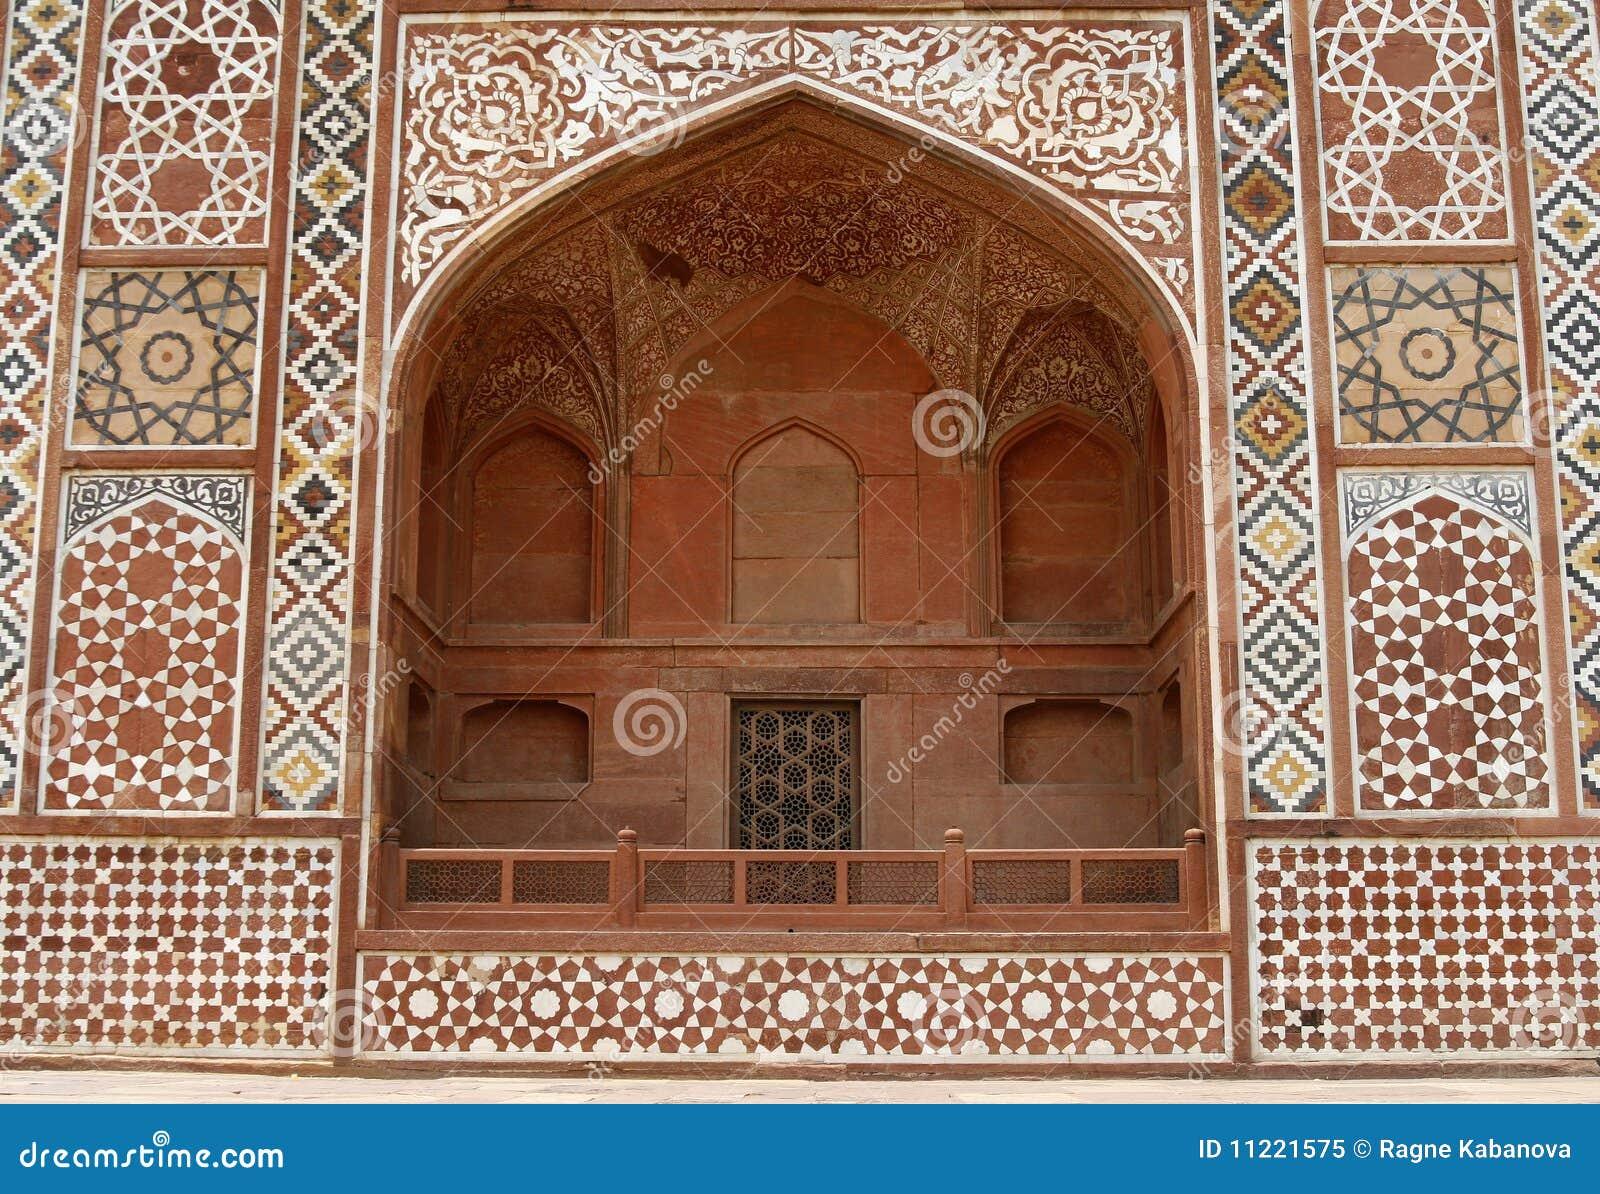 Ornate facade of Akbar s Tomb. Agra, India